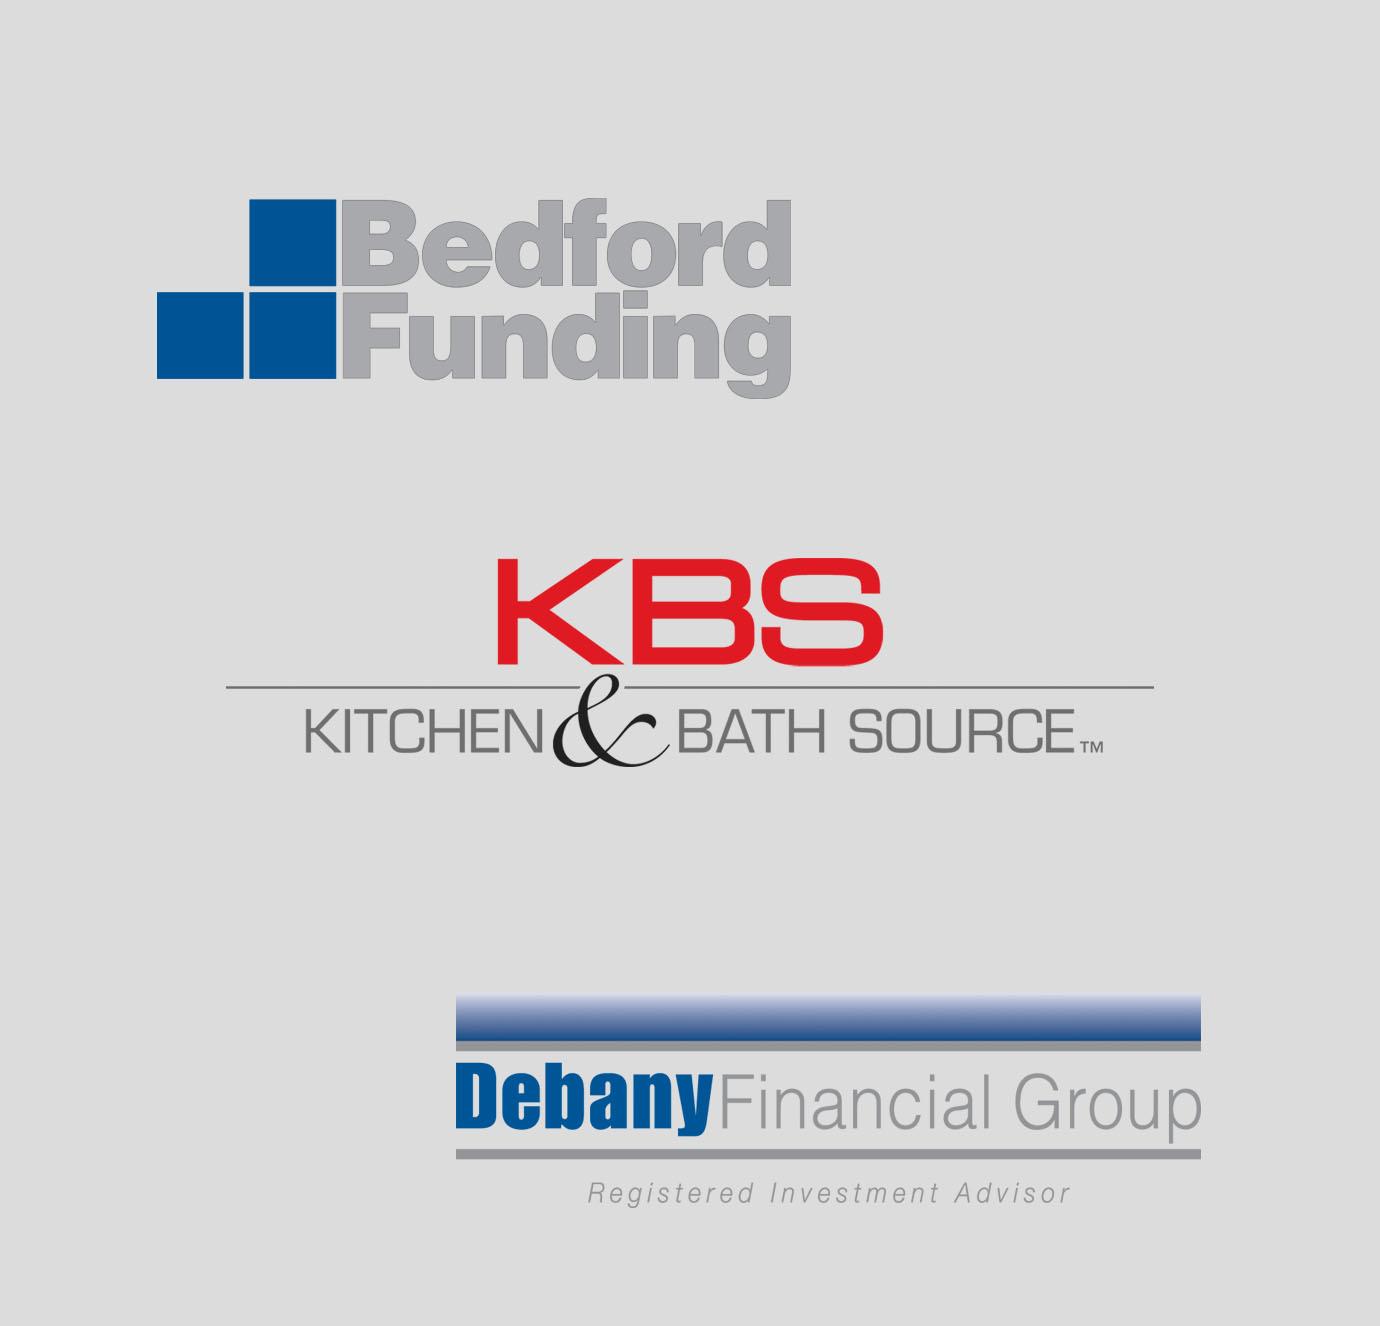 Logo Design and Corporate Branding